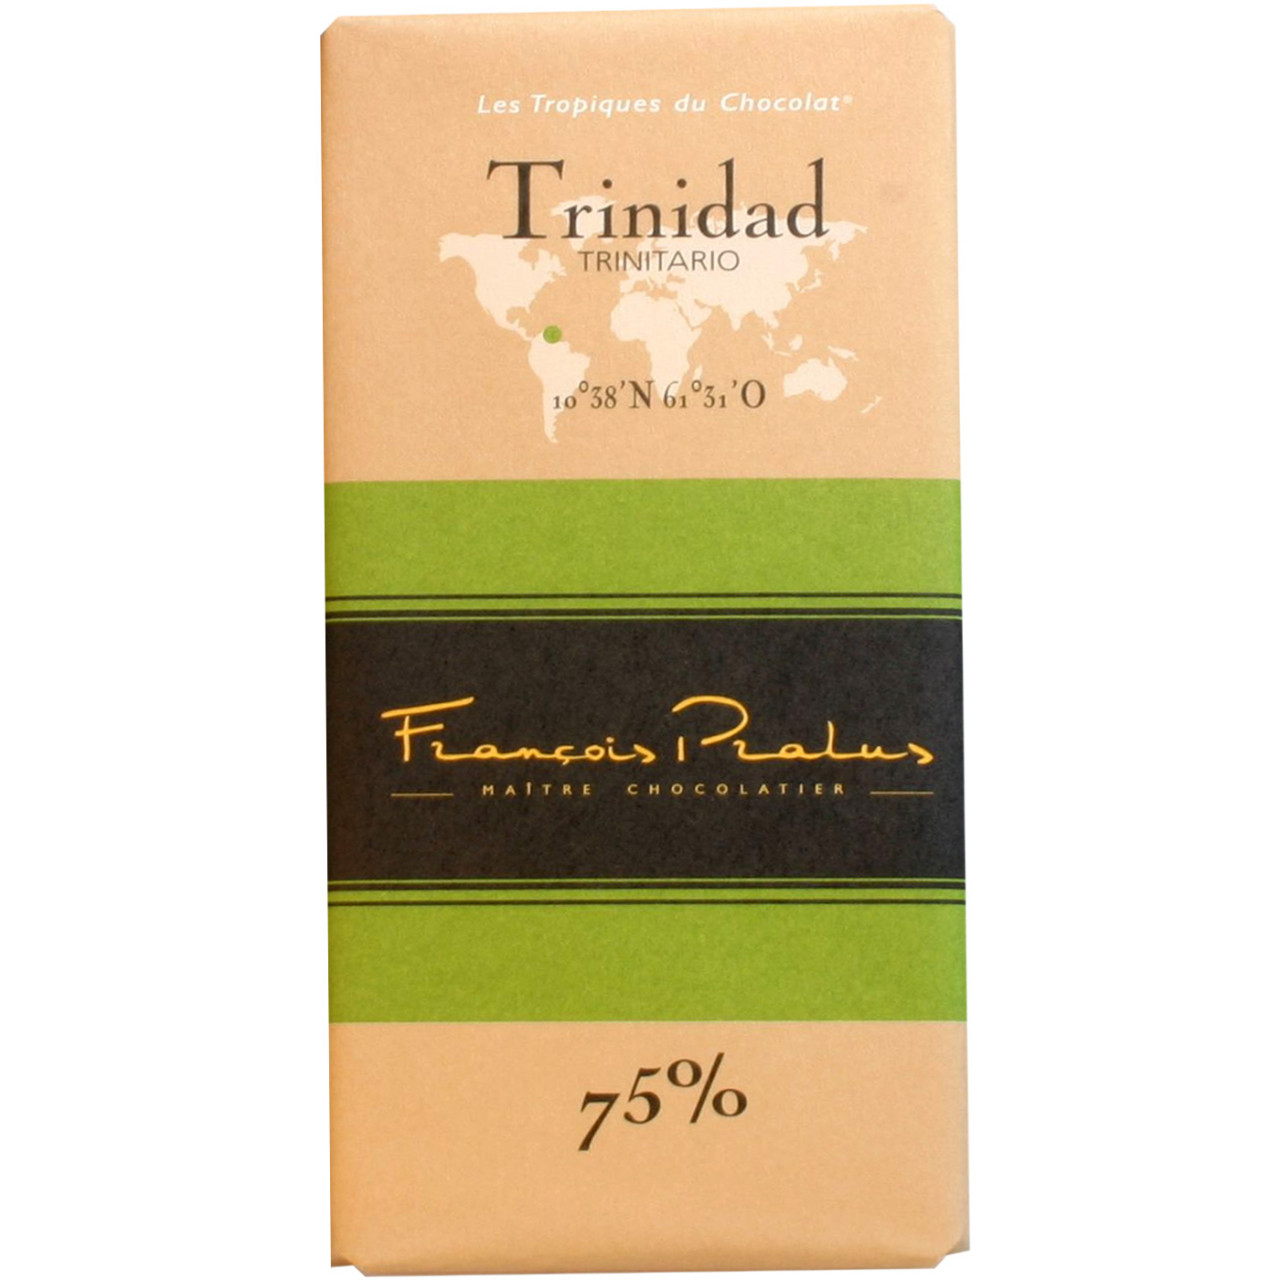 Dunkle Schokolade, 75%, Trinidad, Trinitario, dark chocolate, chocolat noir, Herkunftsschokolade, Bean to bar,                                                                                           - Barras de chocolate, Francia, chocolate francés - Chocolats-De-Luxe